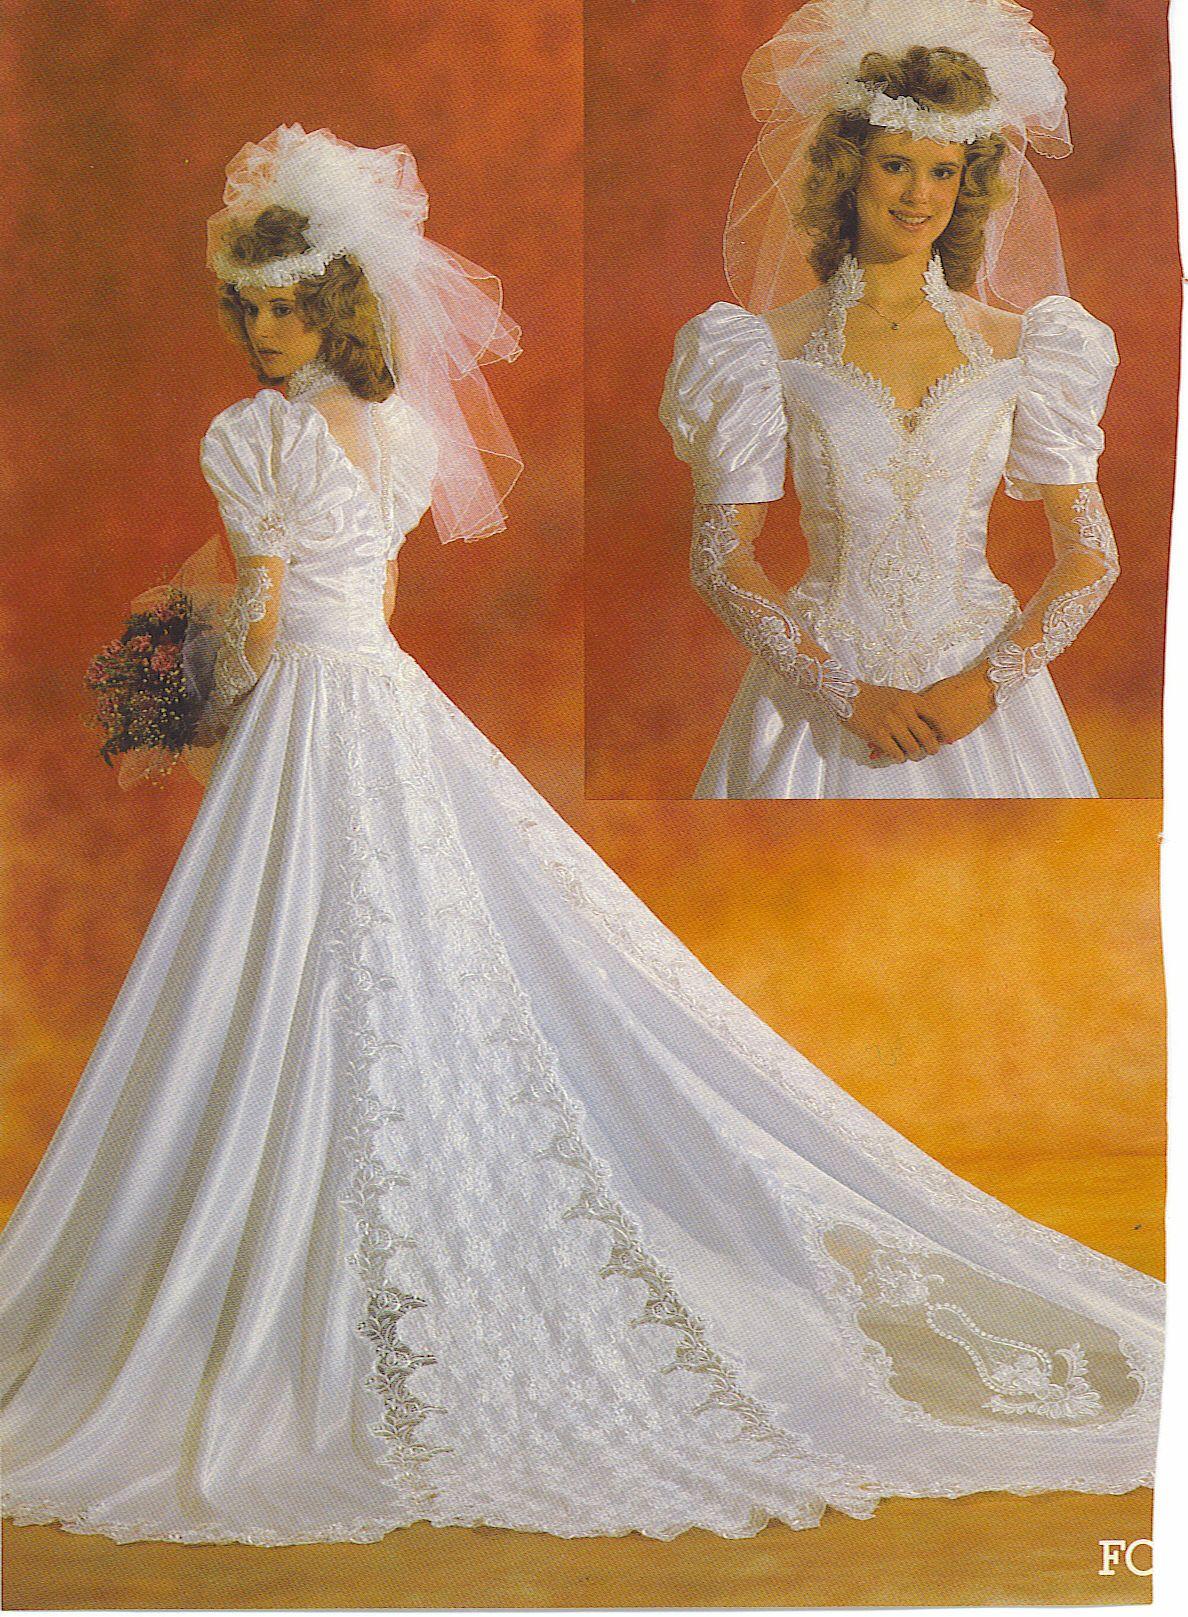 Pin von Transvestita Transvestit Transvestitni auf Gowns & Dresses ...